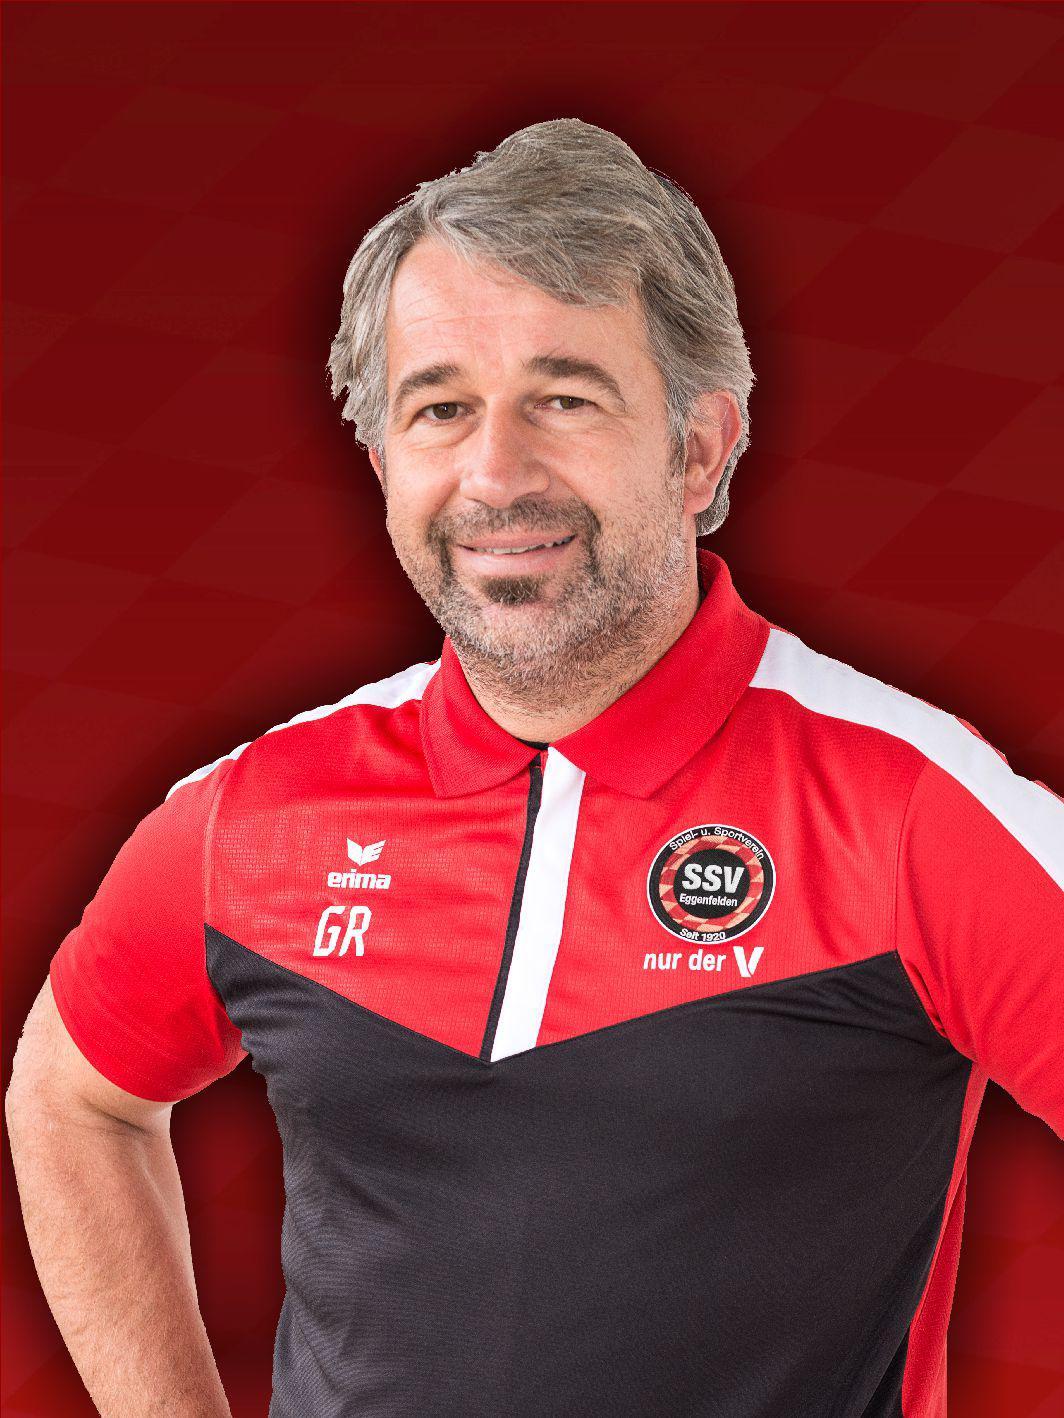 Gerhard Reiter